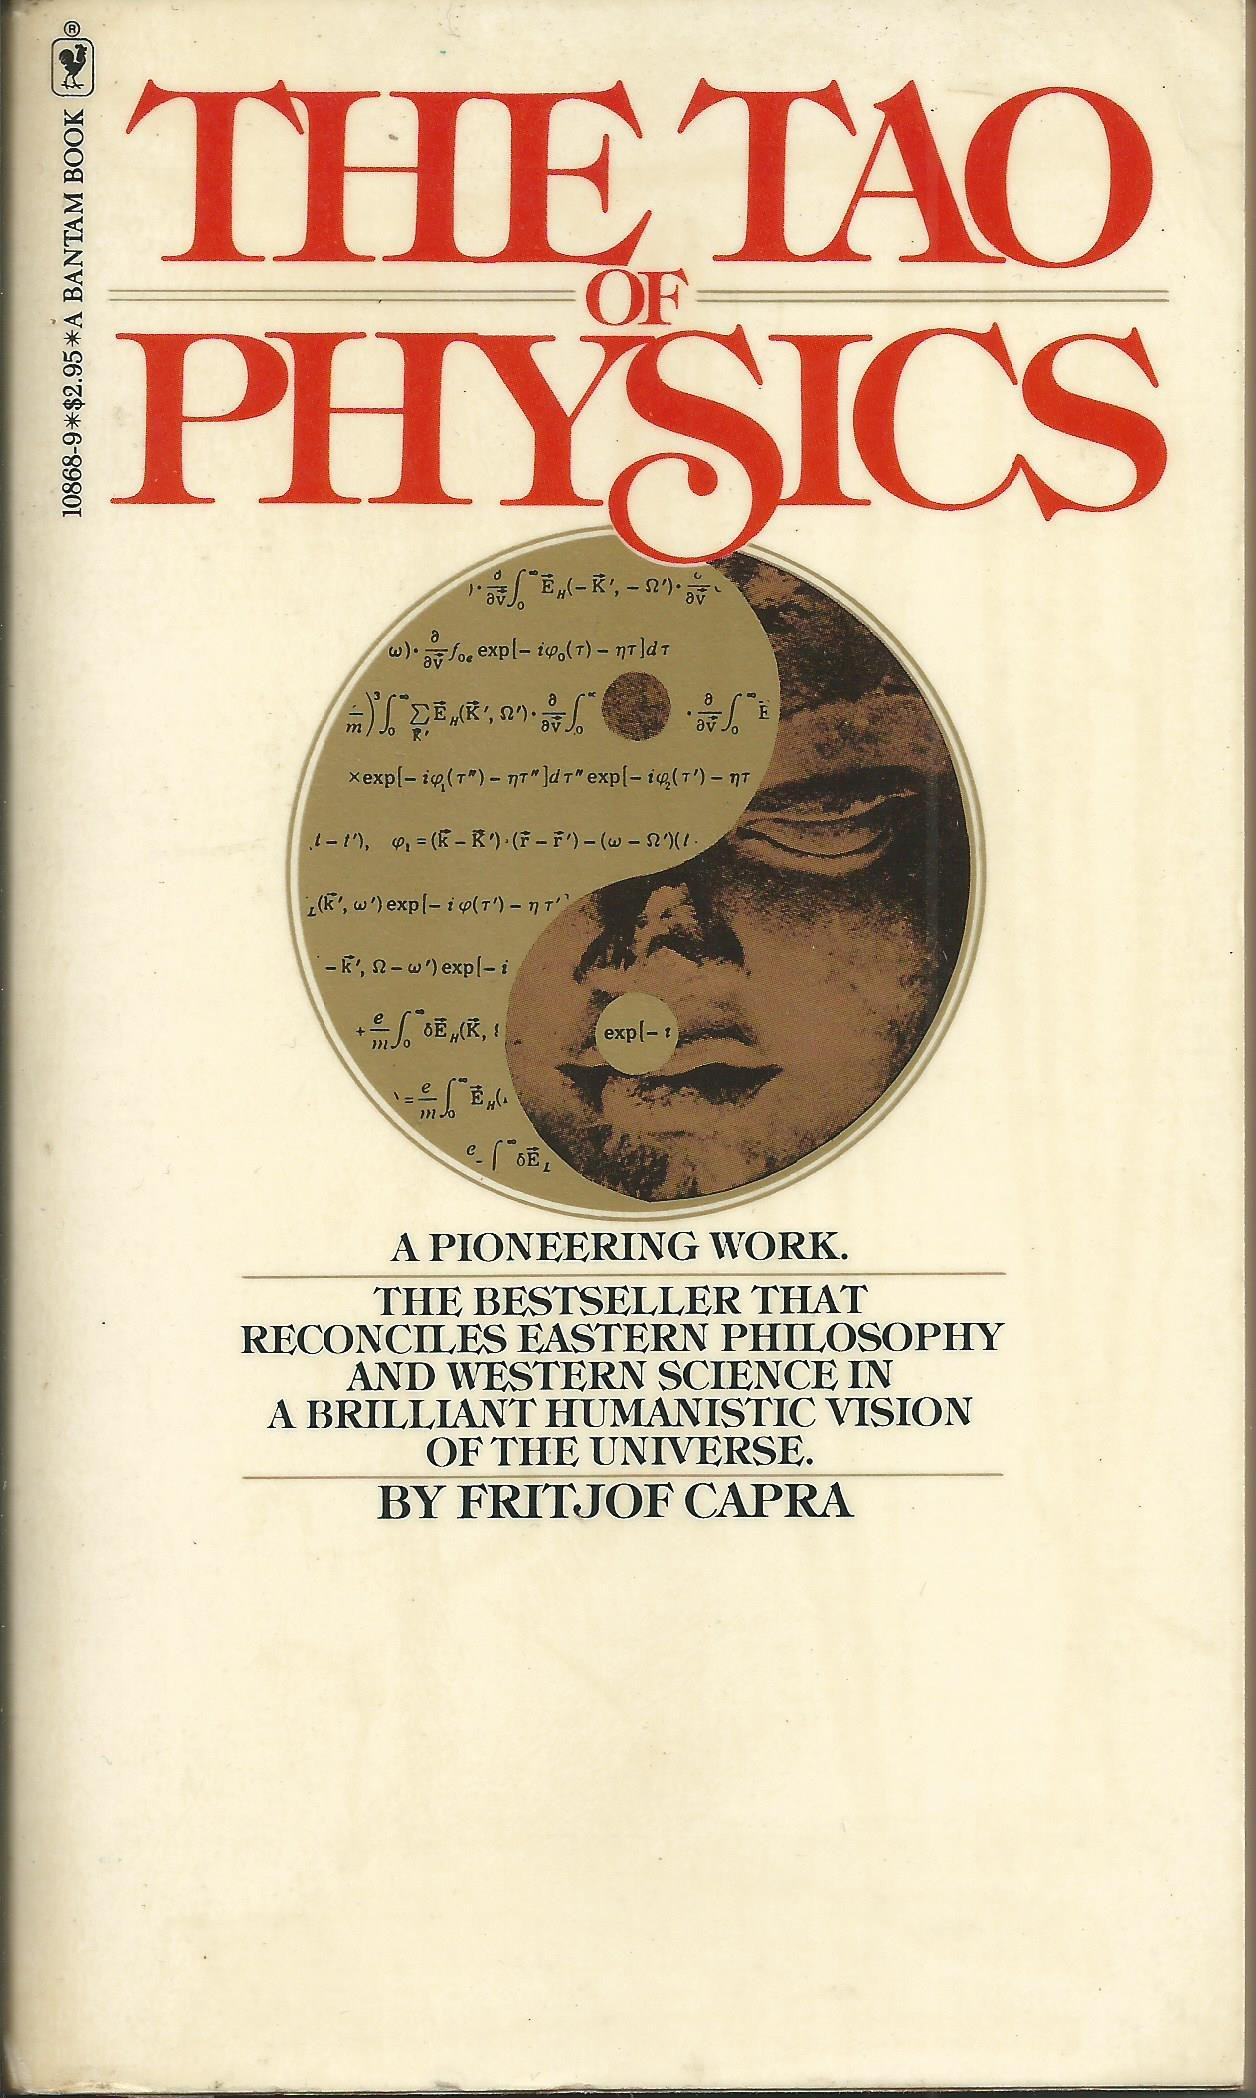 The Tao of Physics, Fritjof Capra